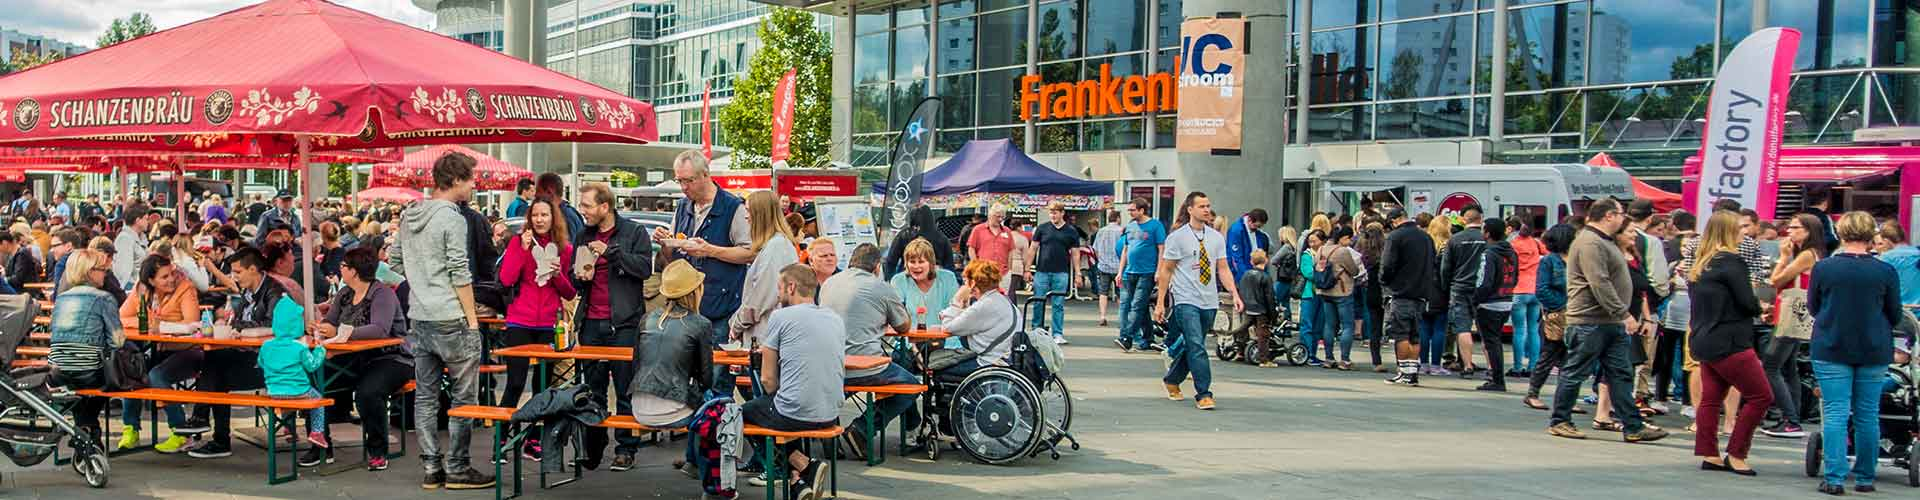 Foodtruck RoundUp Nürnberg